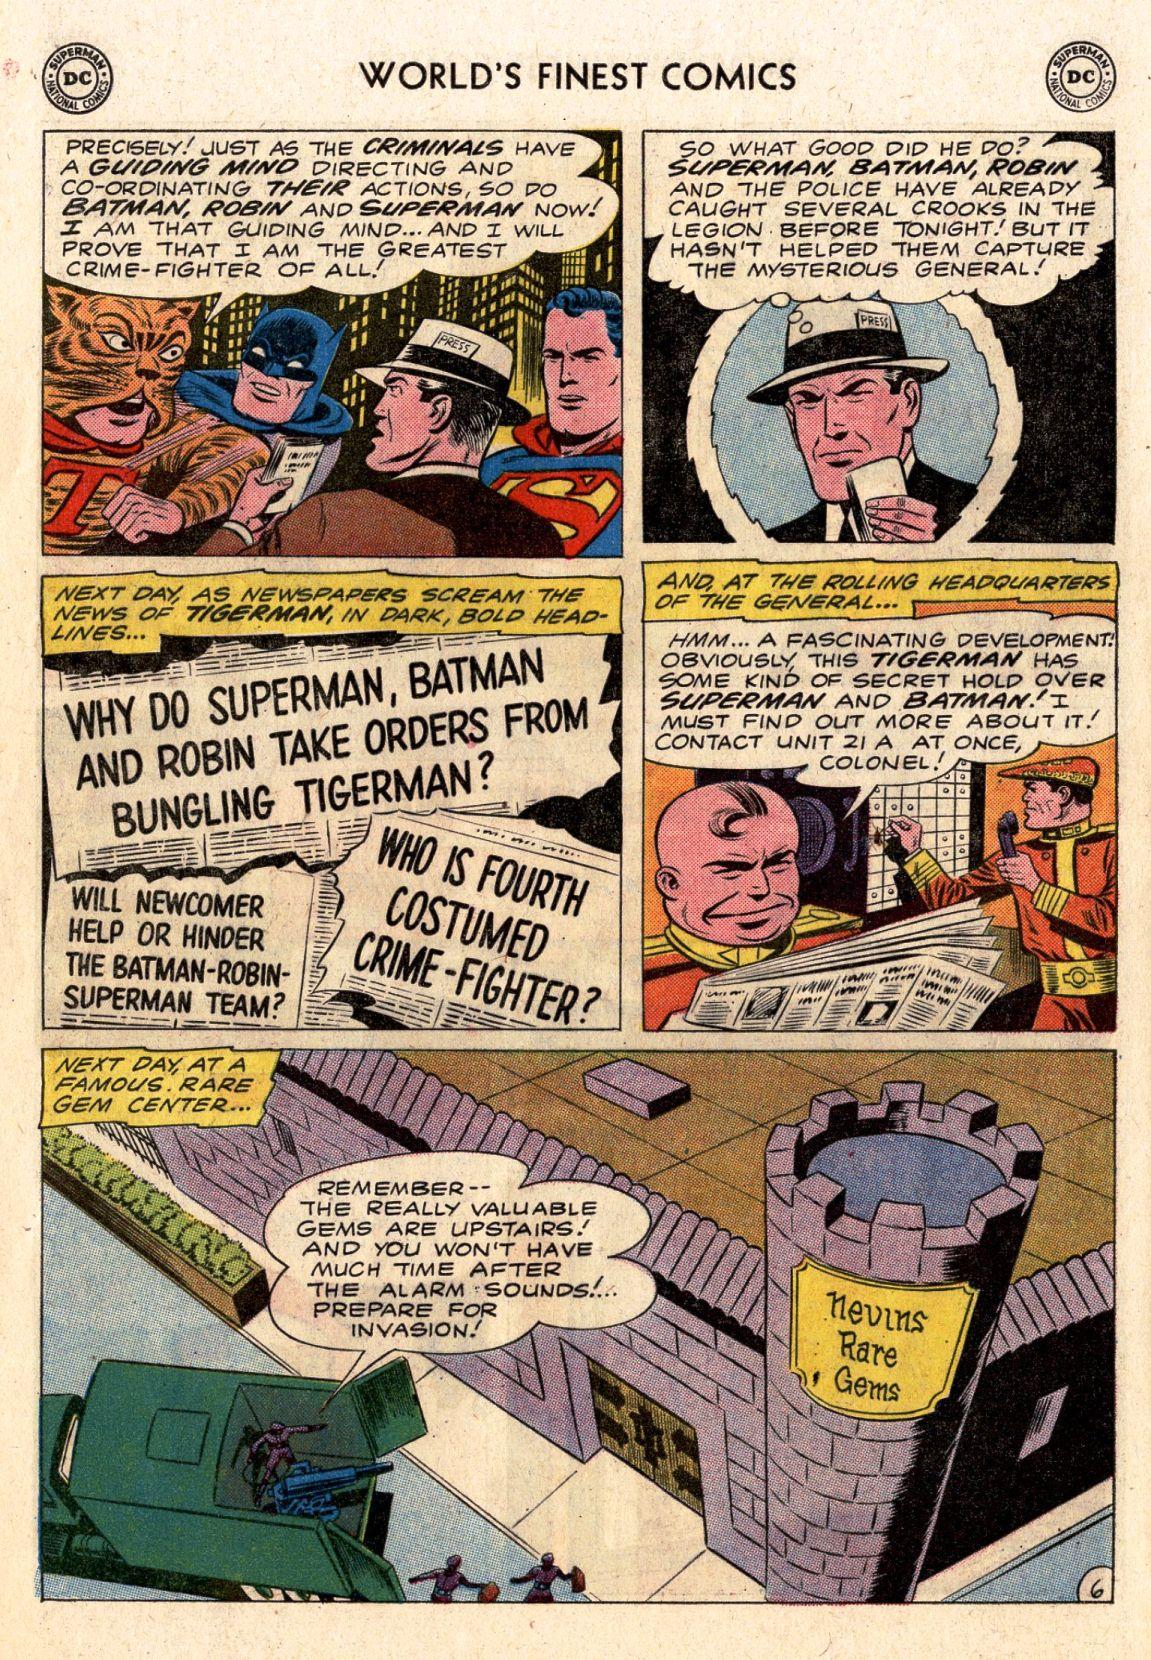 Read online World's Finest Comics comic -  Issue #119 - 8